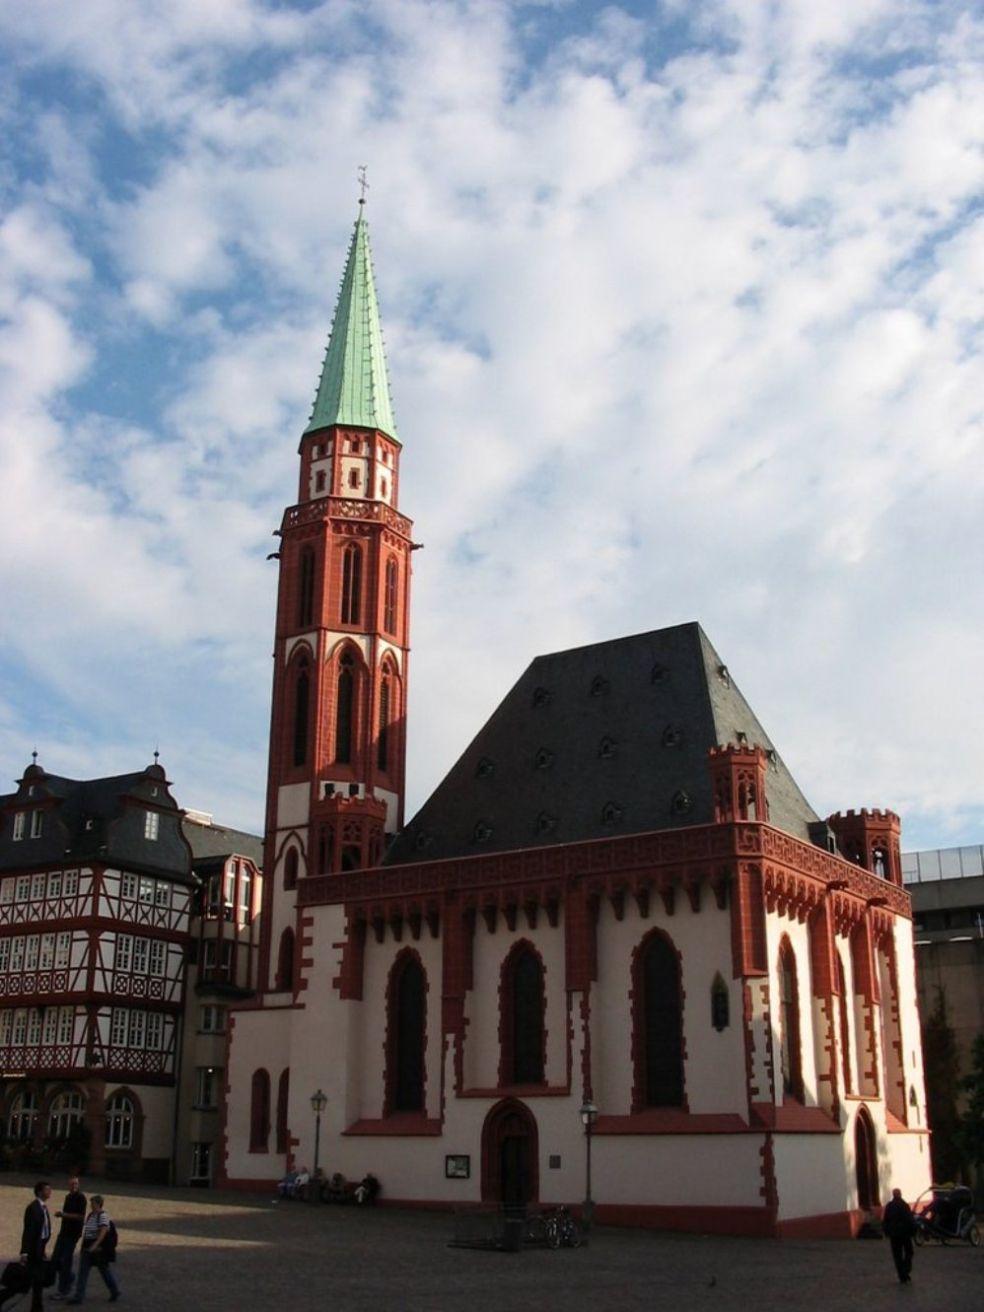 Франкфурт - чем он так знаменит?